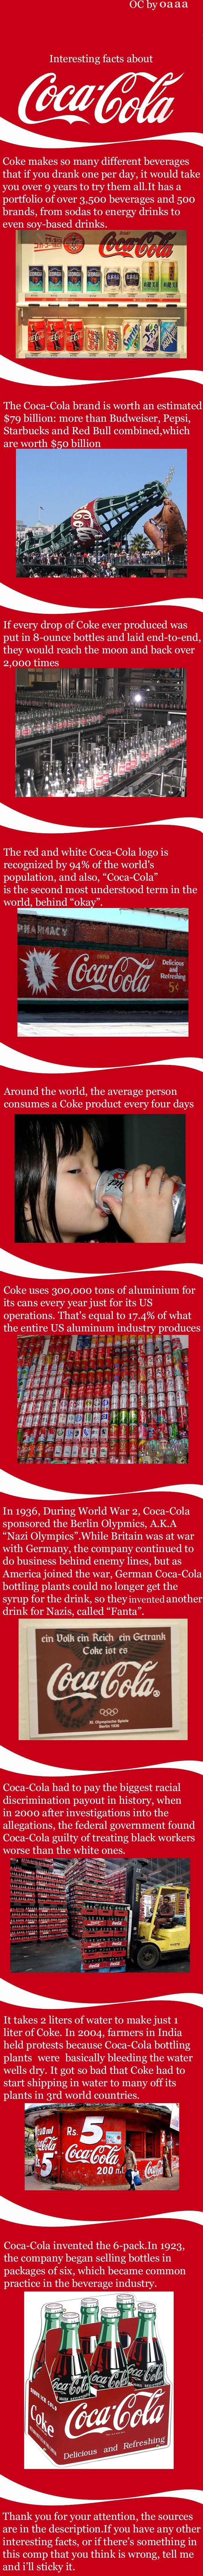 interesting coca cola facts. .